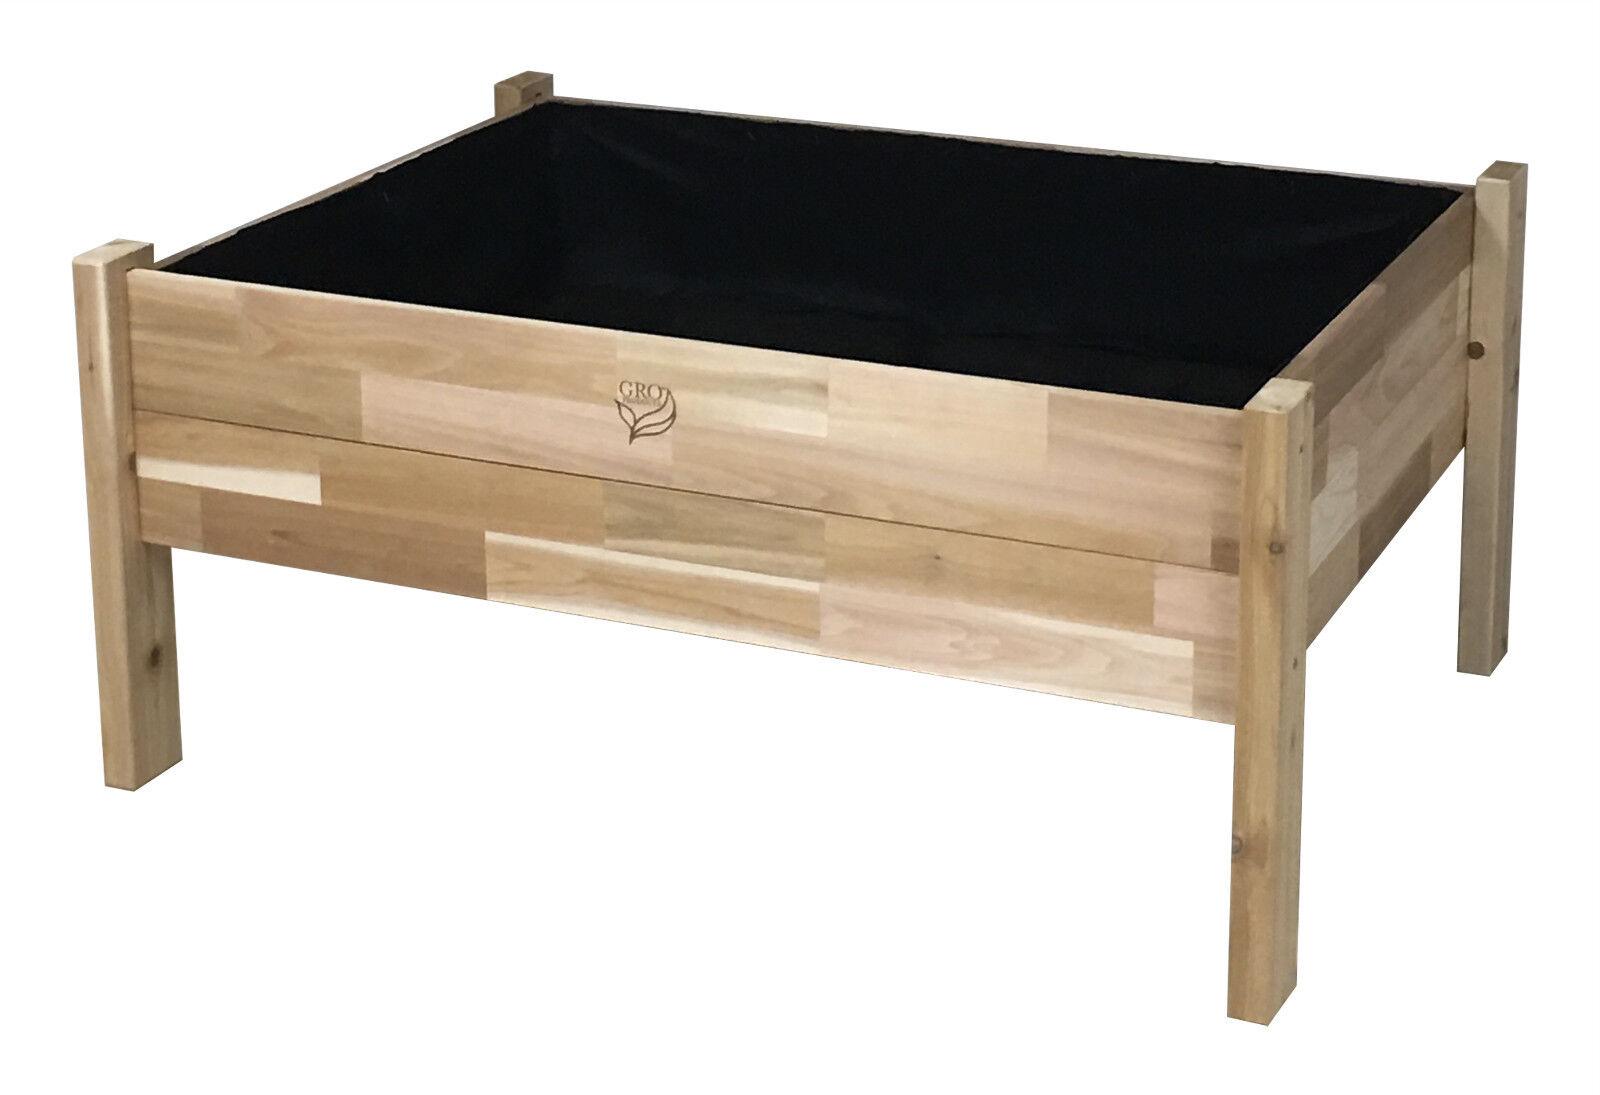 Elevated Garden Bed Planter EGB2-3648 - $293.95